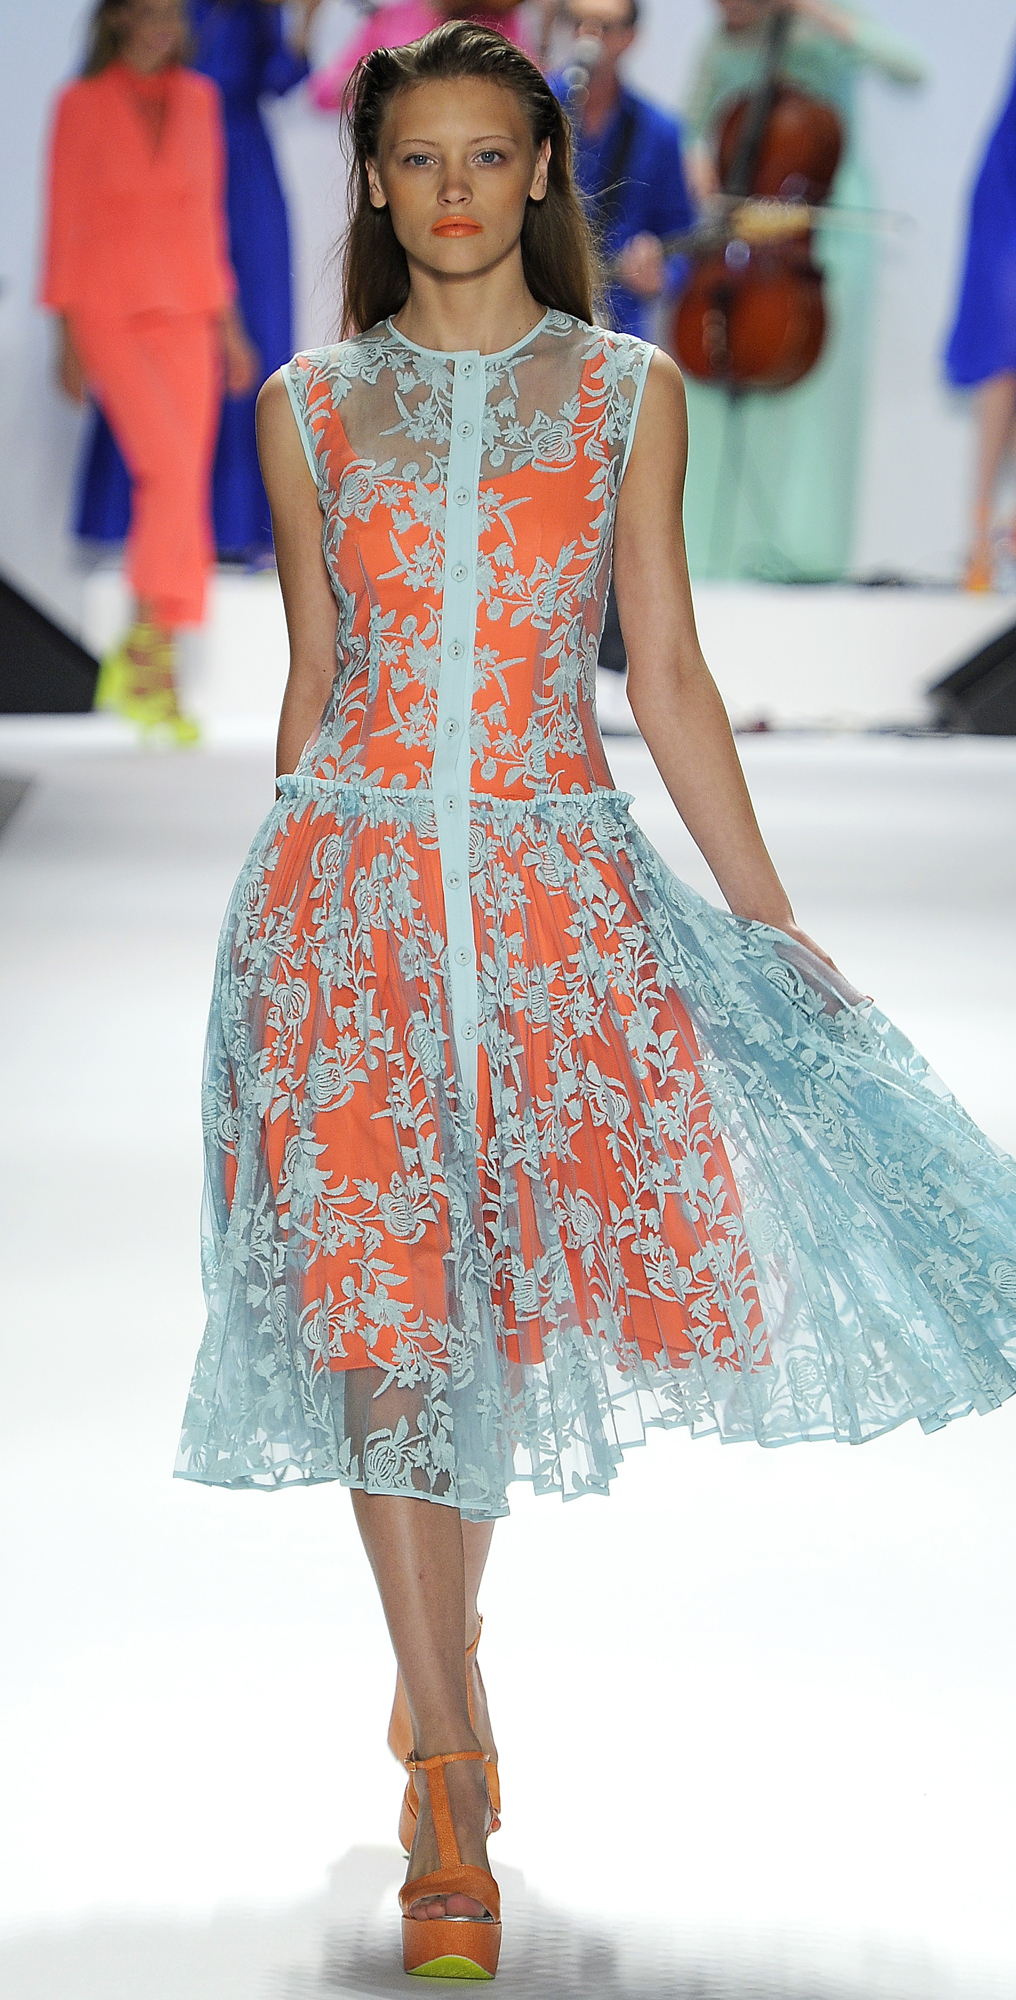 Image result for varsity lace dress nanette lepore